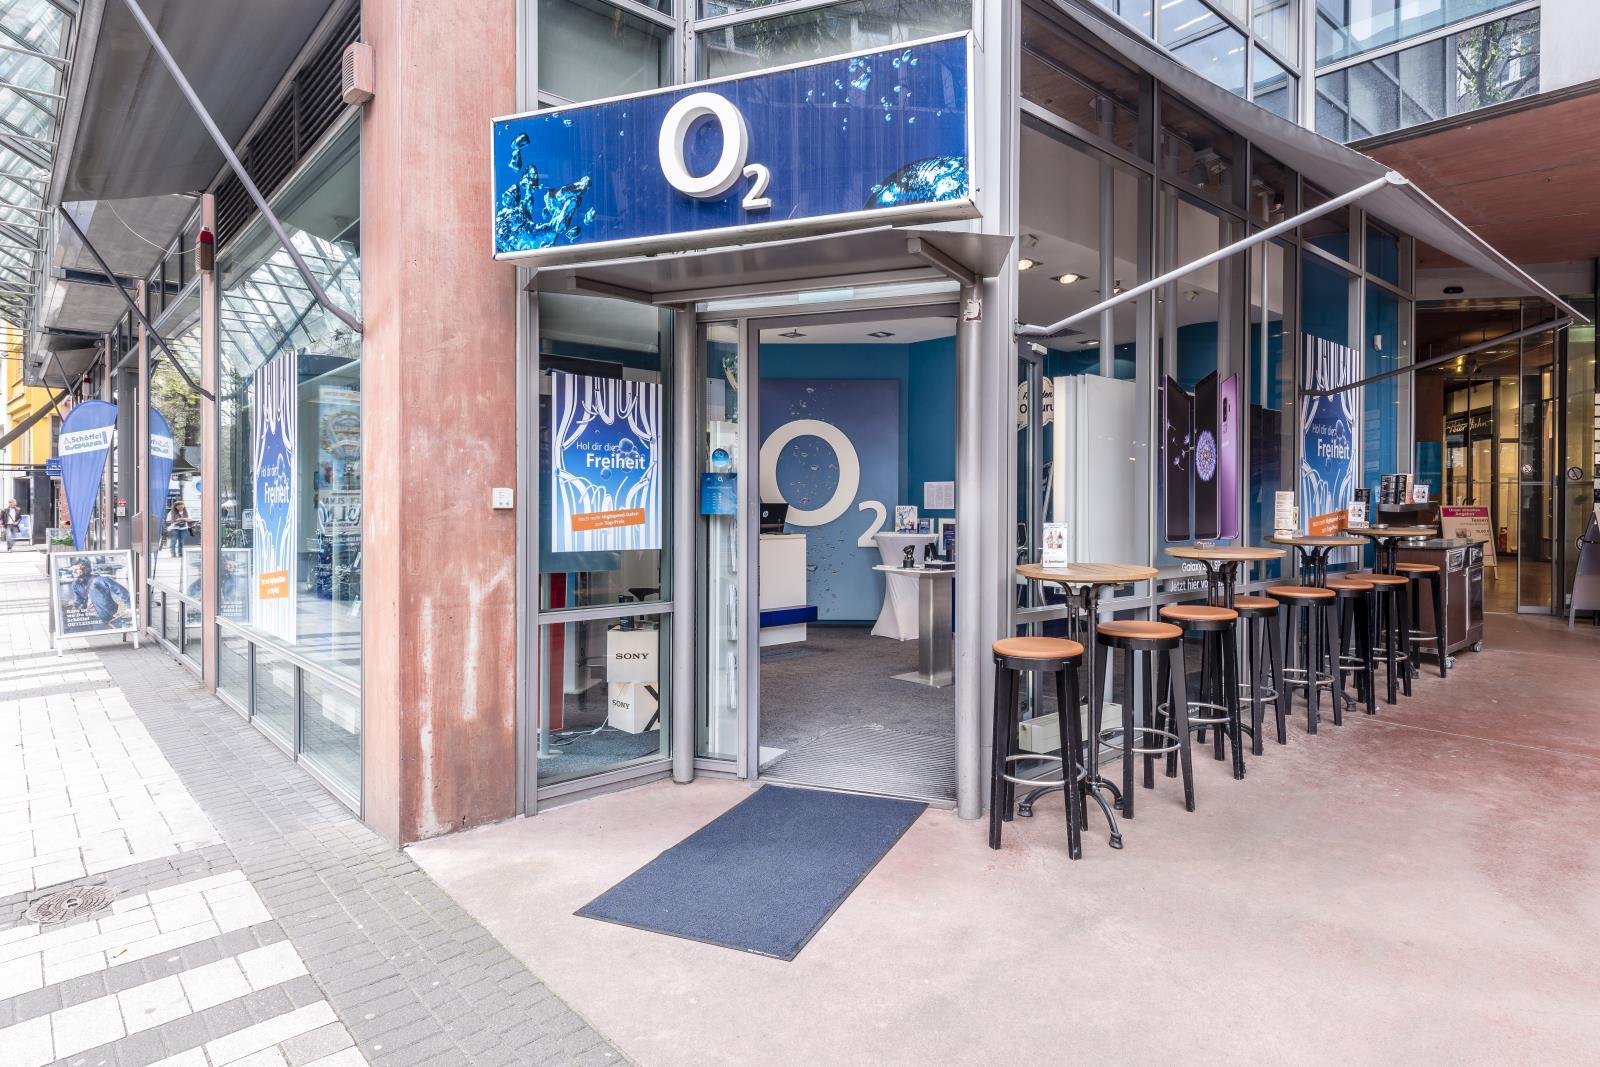 o2 Shop, Breite Str. 6-26 in Köln